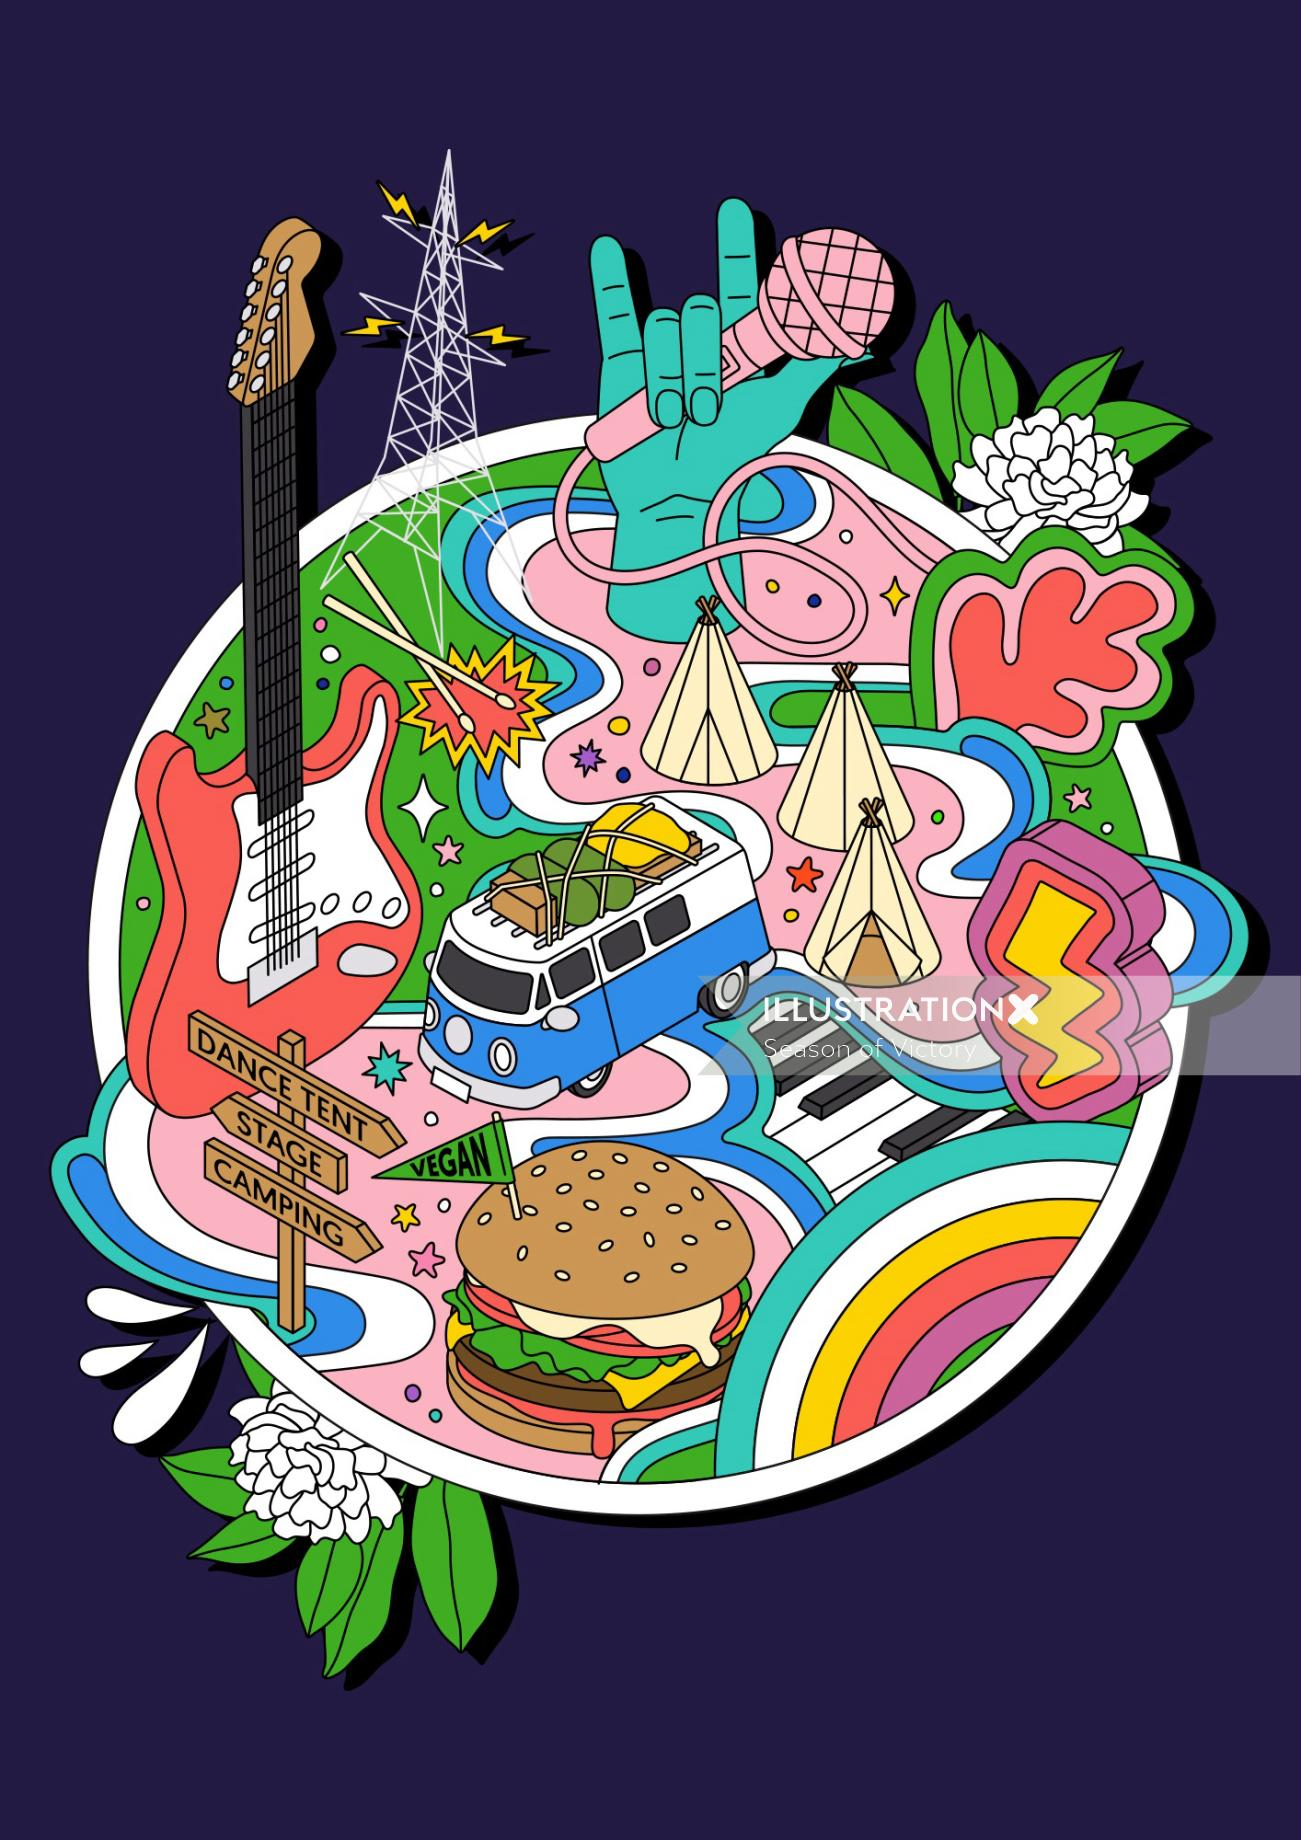 music, music festival, festival, travel, trip, holiday, world, trip, entertainment, outdoor venue, o